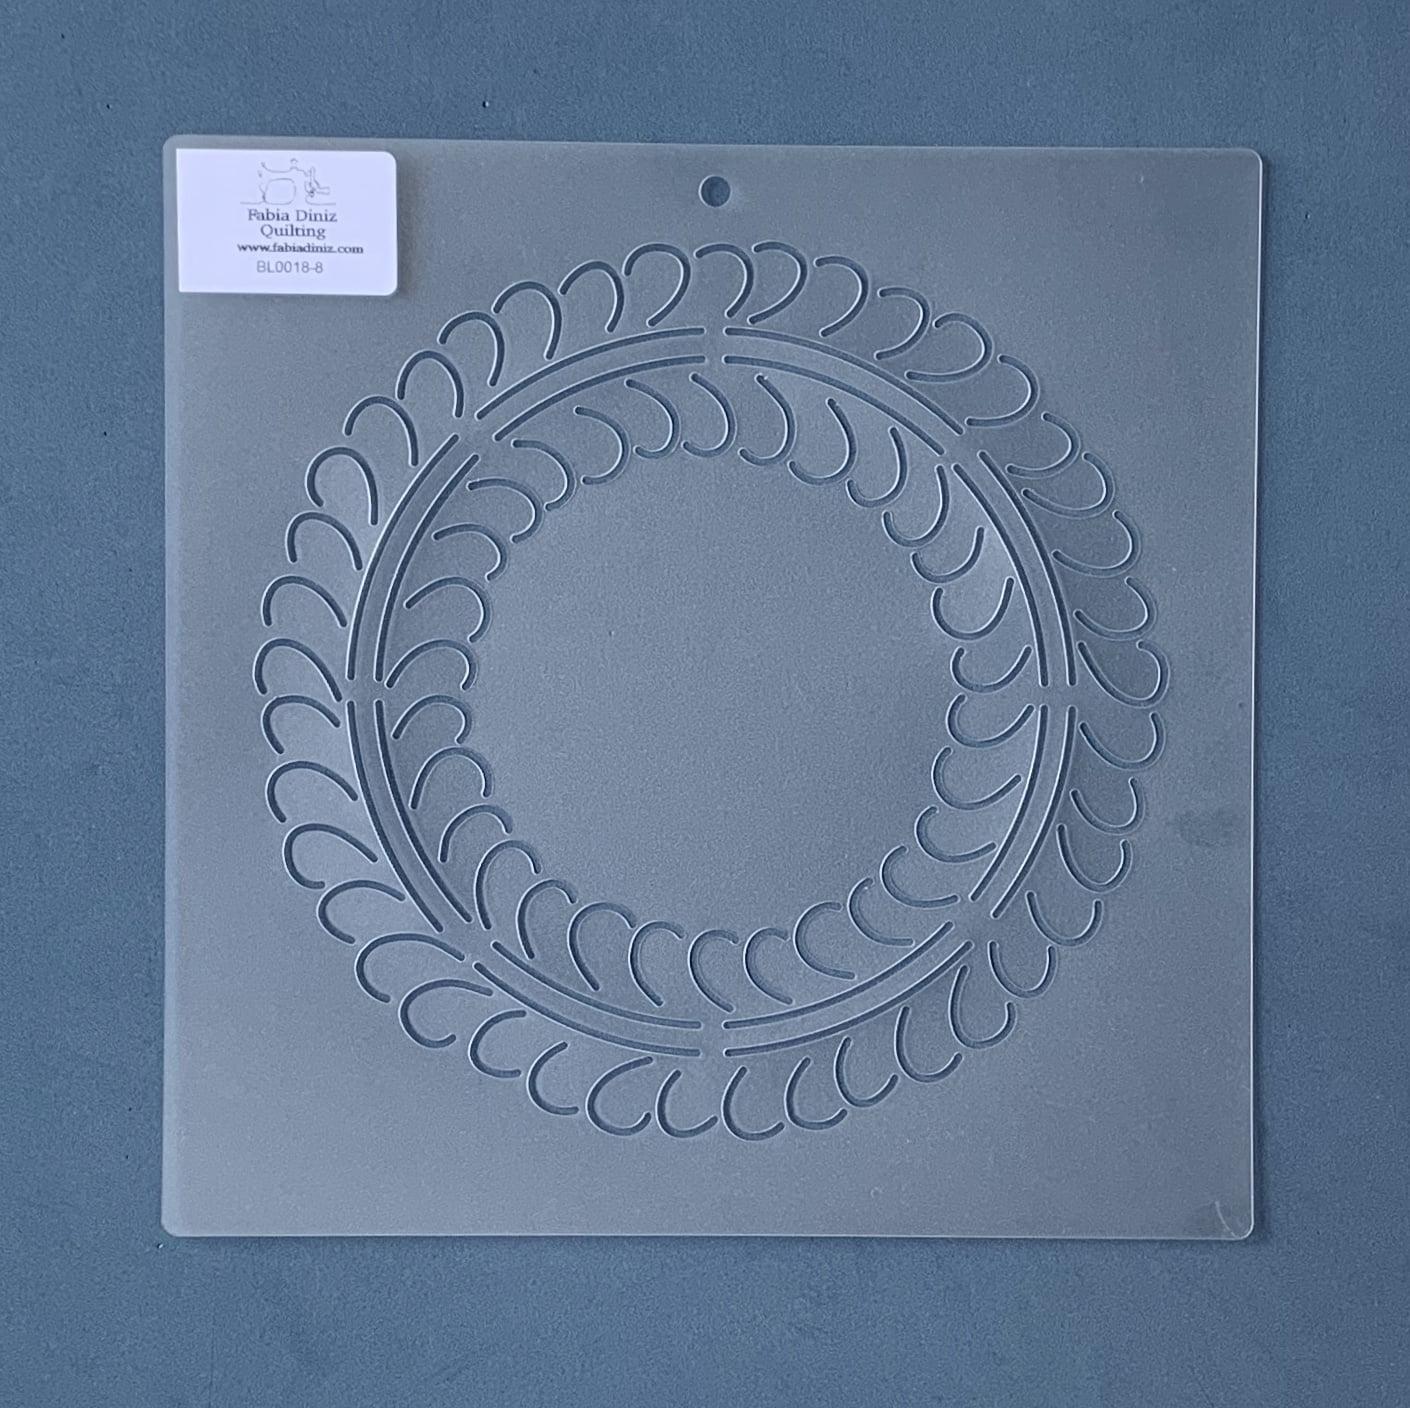 Stencil Bloco Plumas BL-0018-8 23 x 23 cm